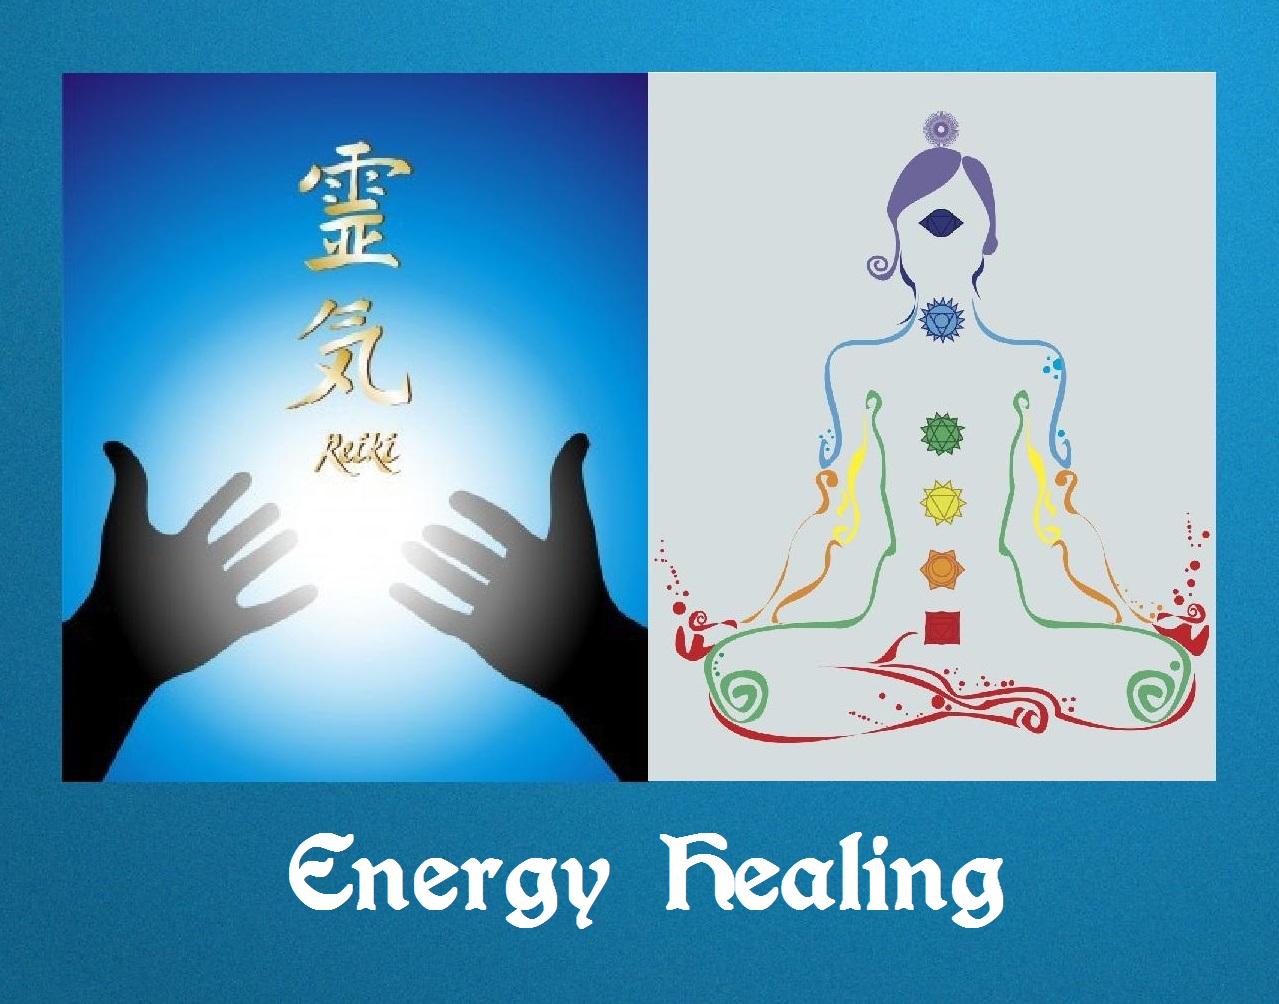 Reiki energy healing - Best comfort food in nyc